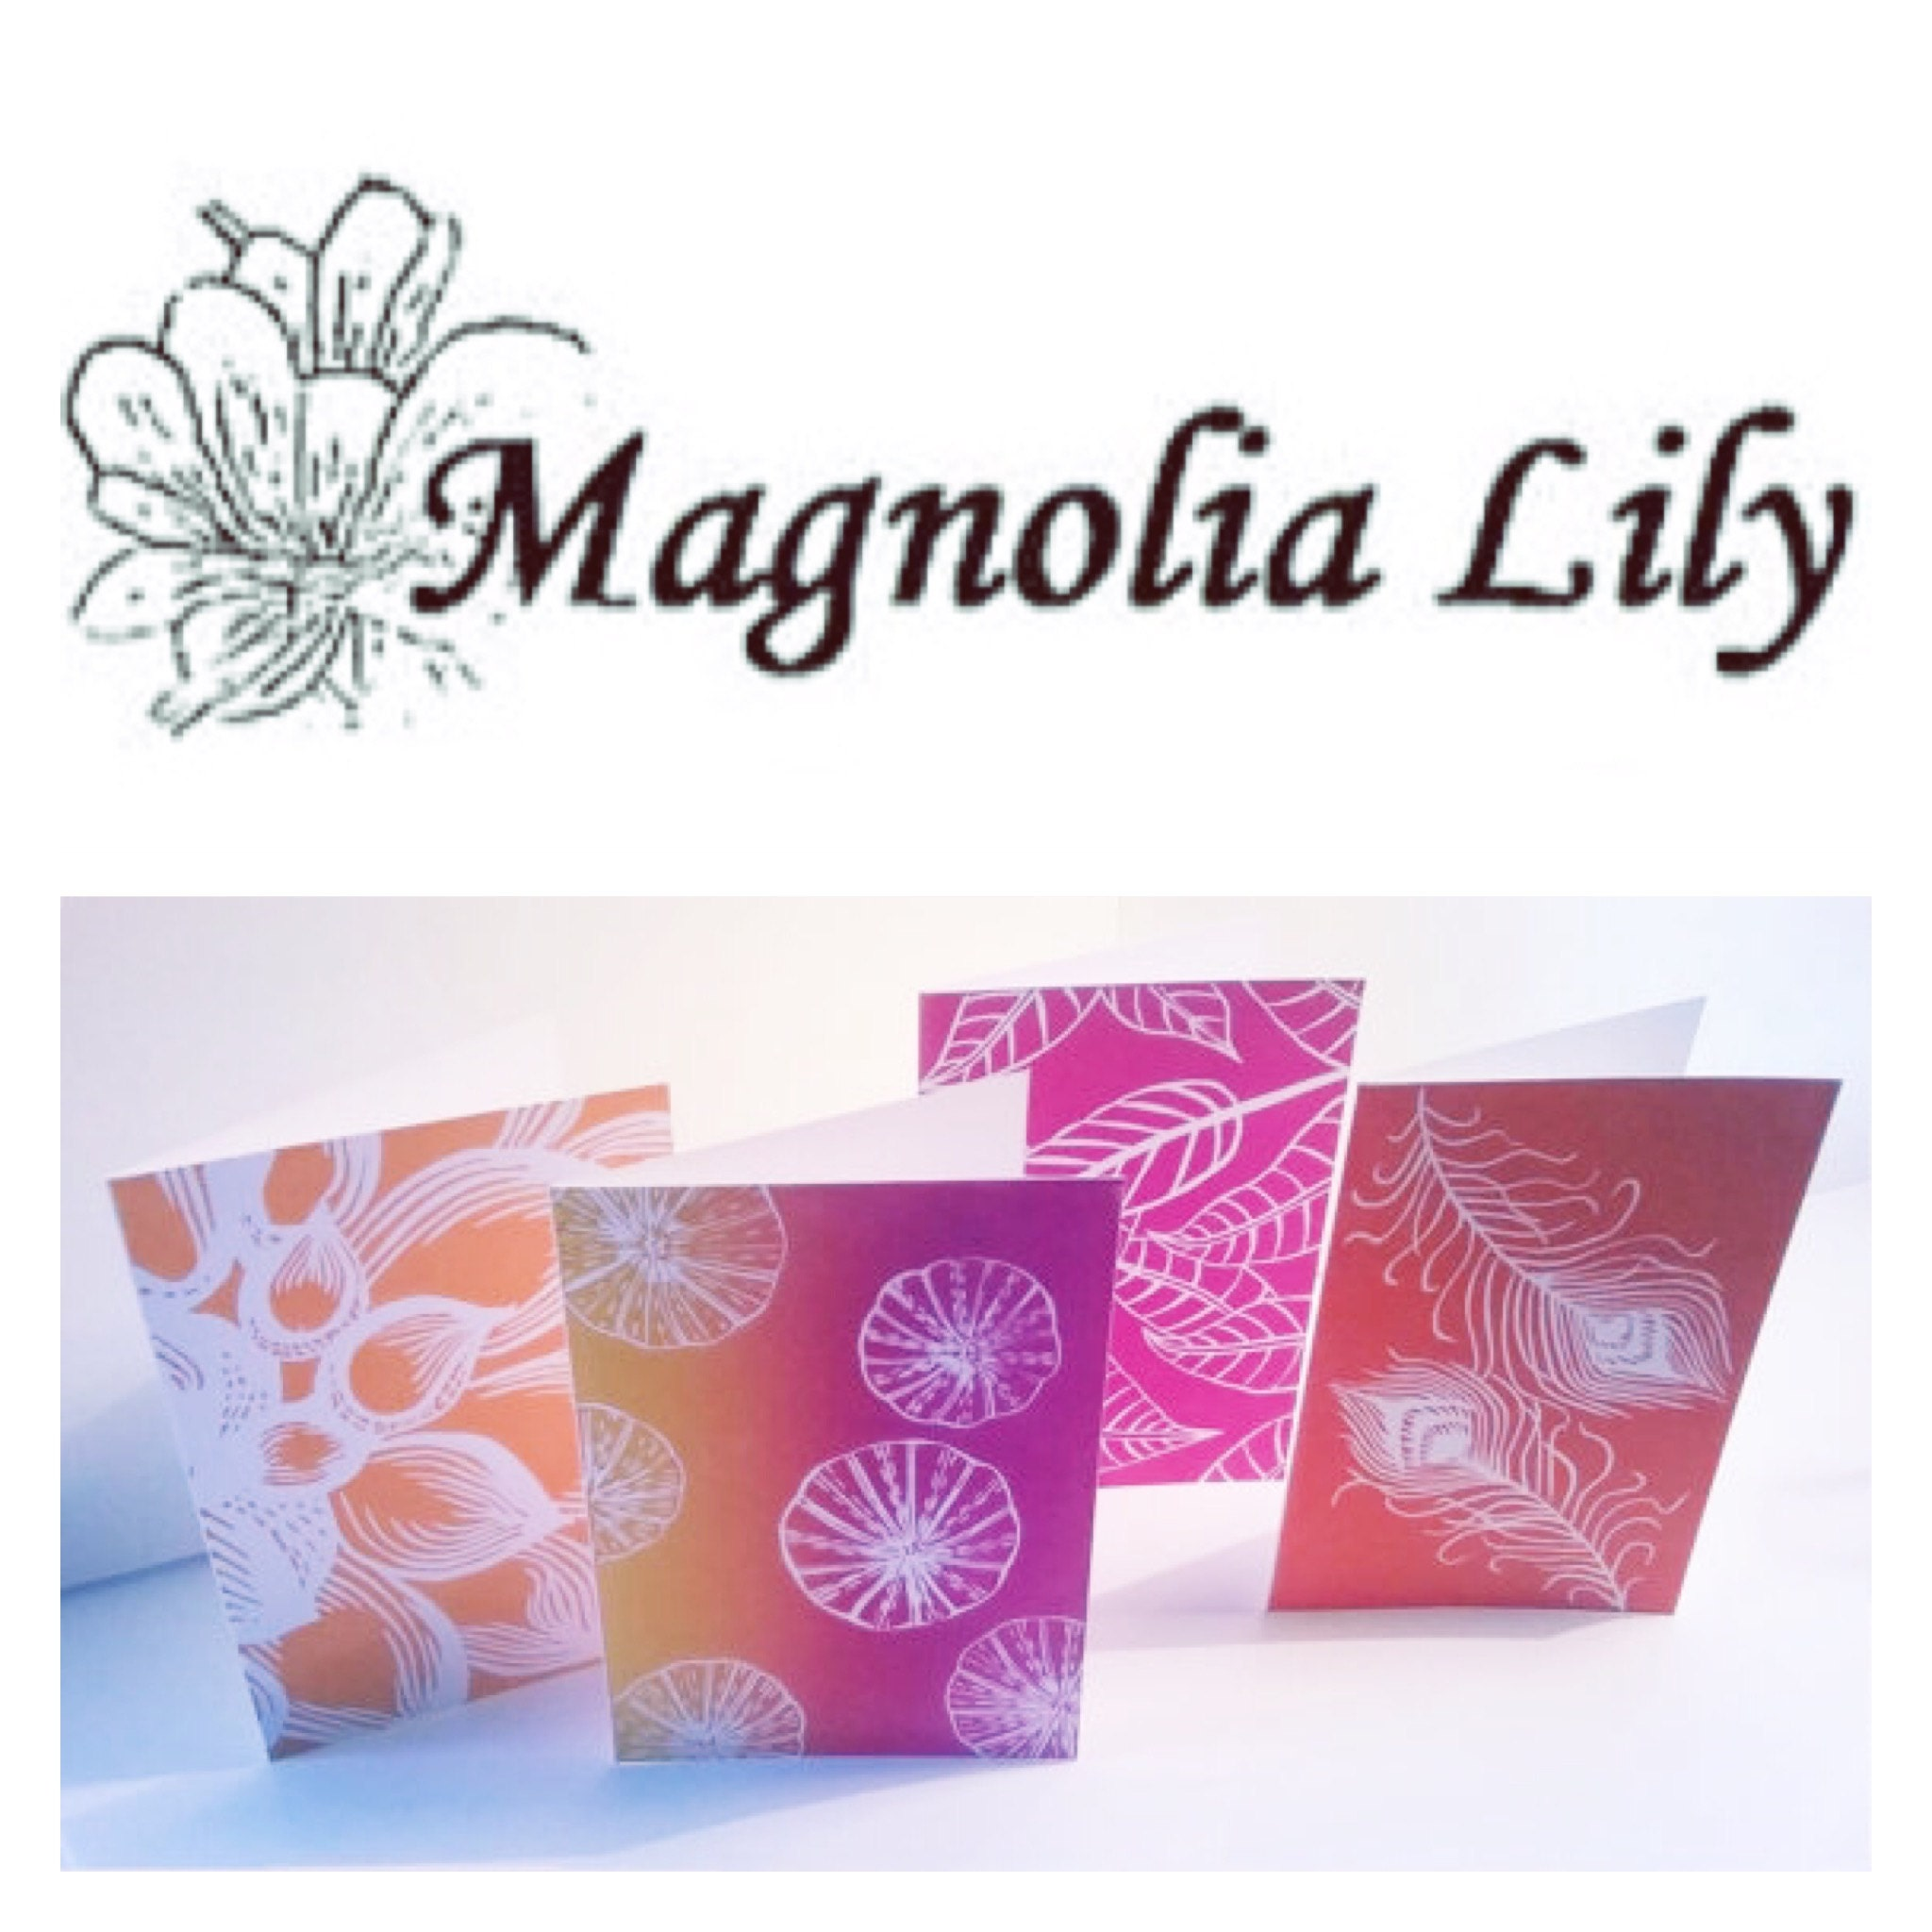 Handmade greeting cards linocut print fine art por MagnoliaLily